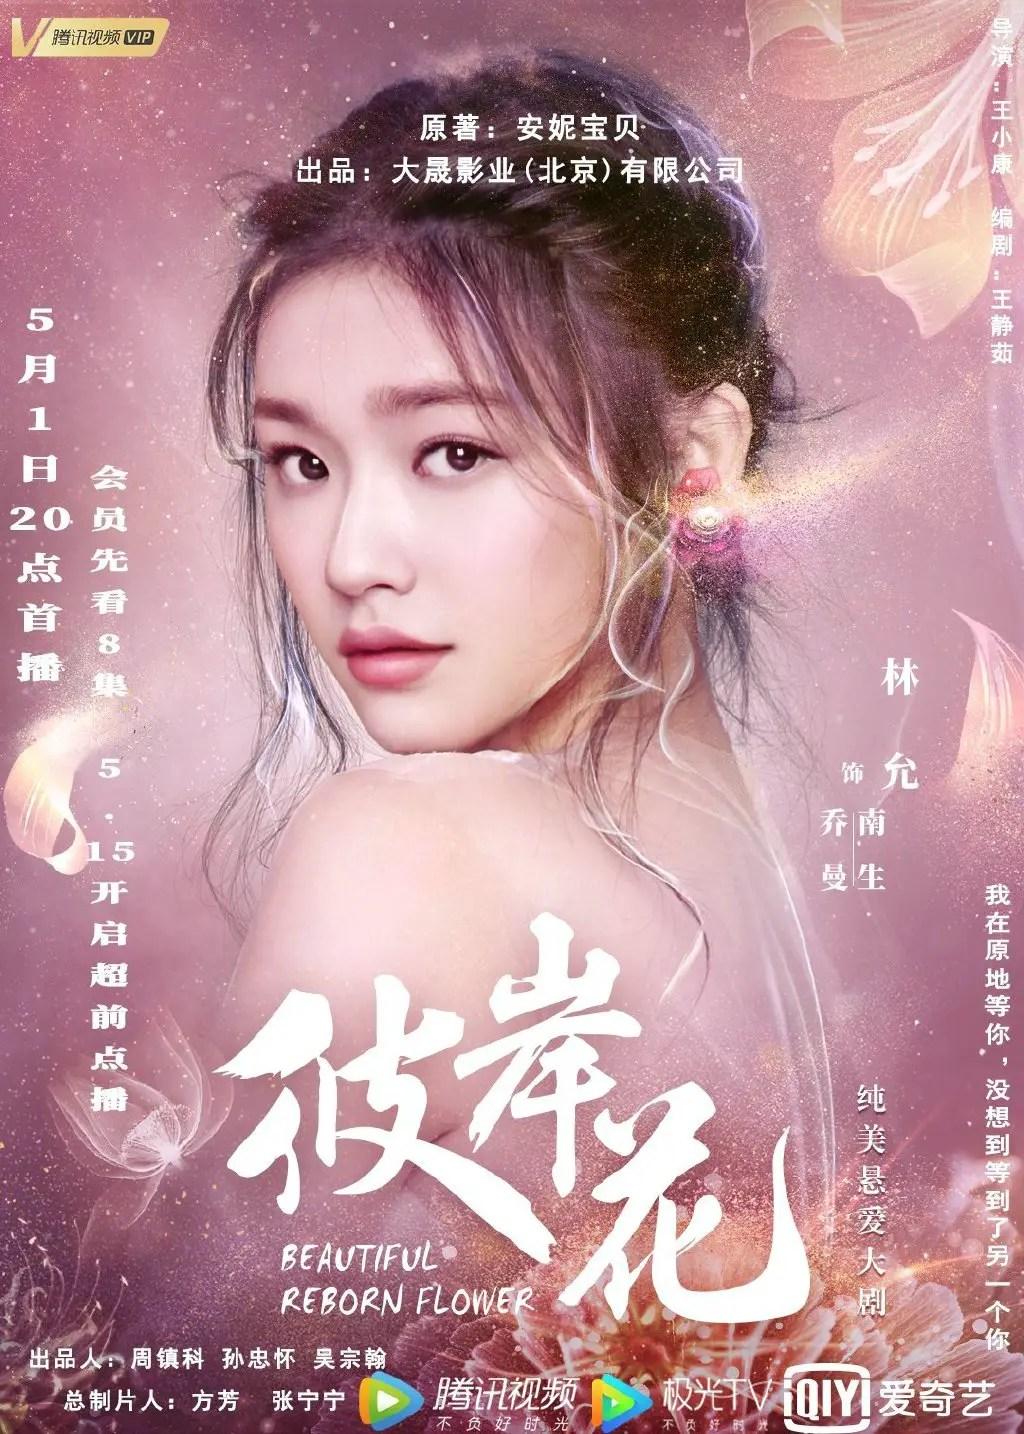 Lin Yun